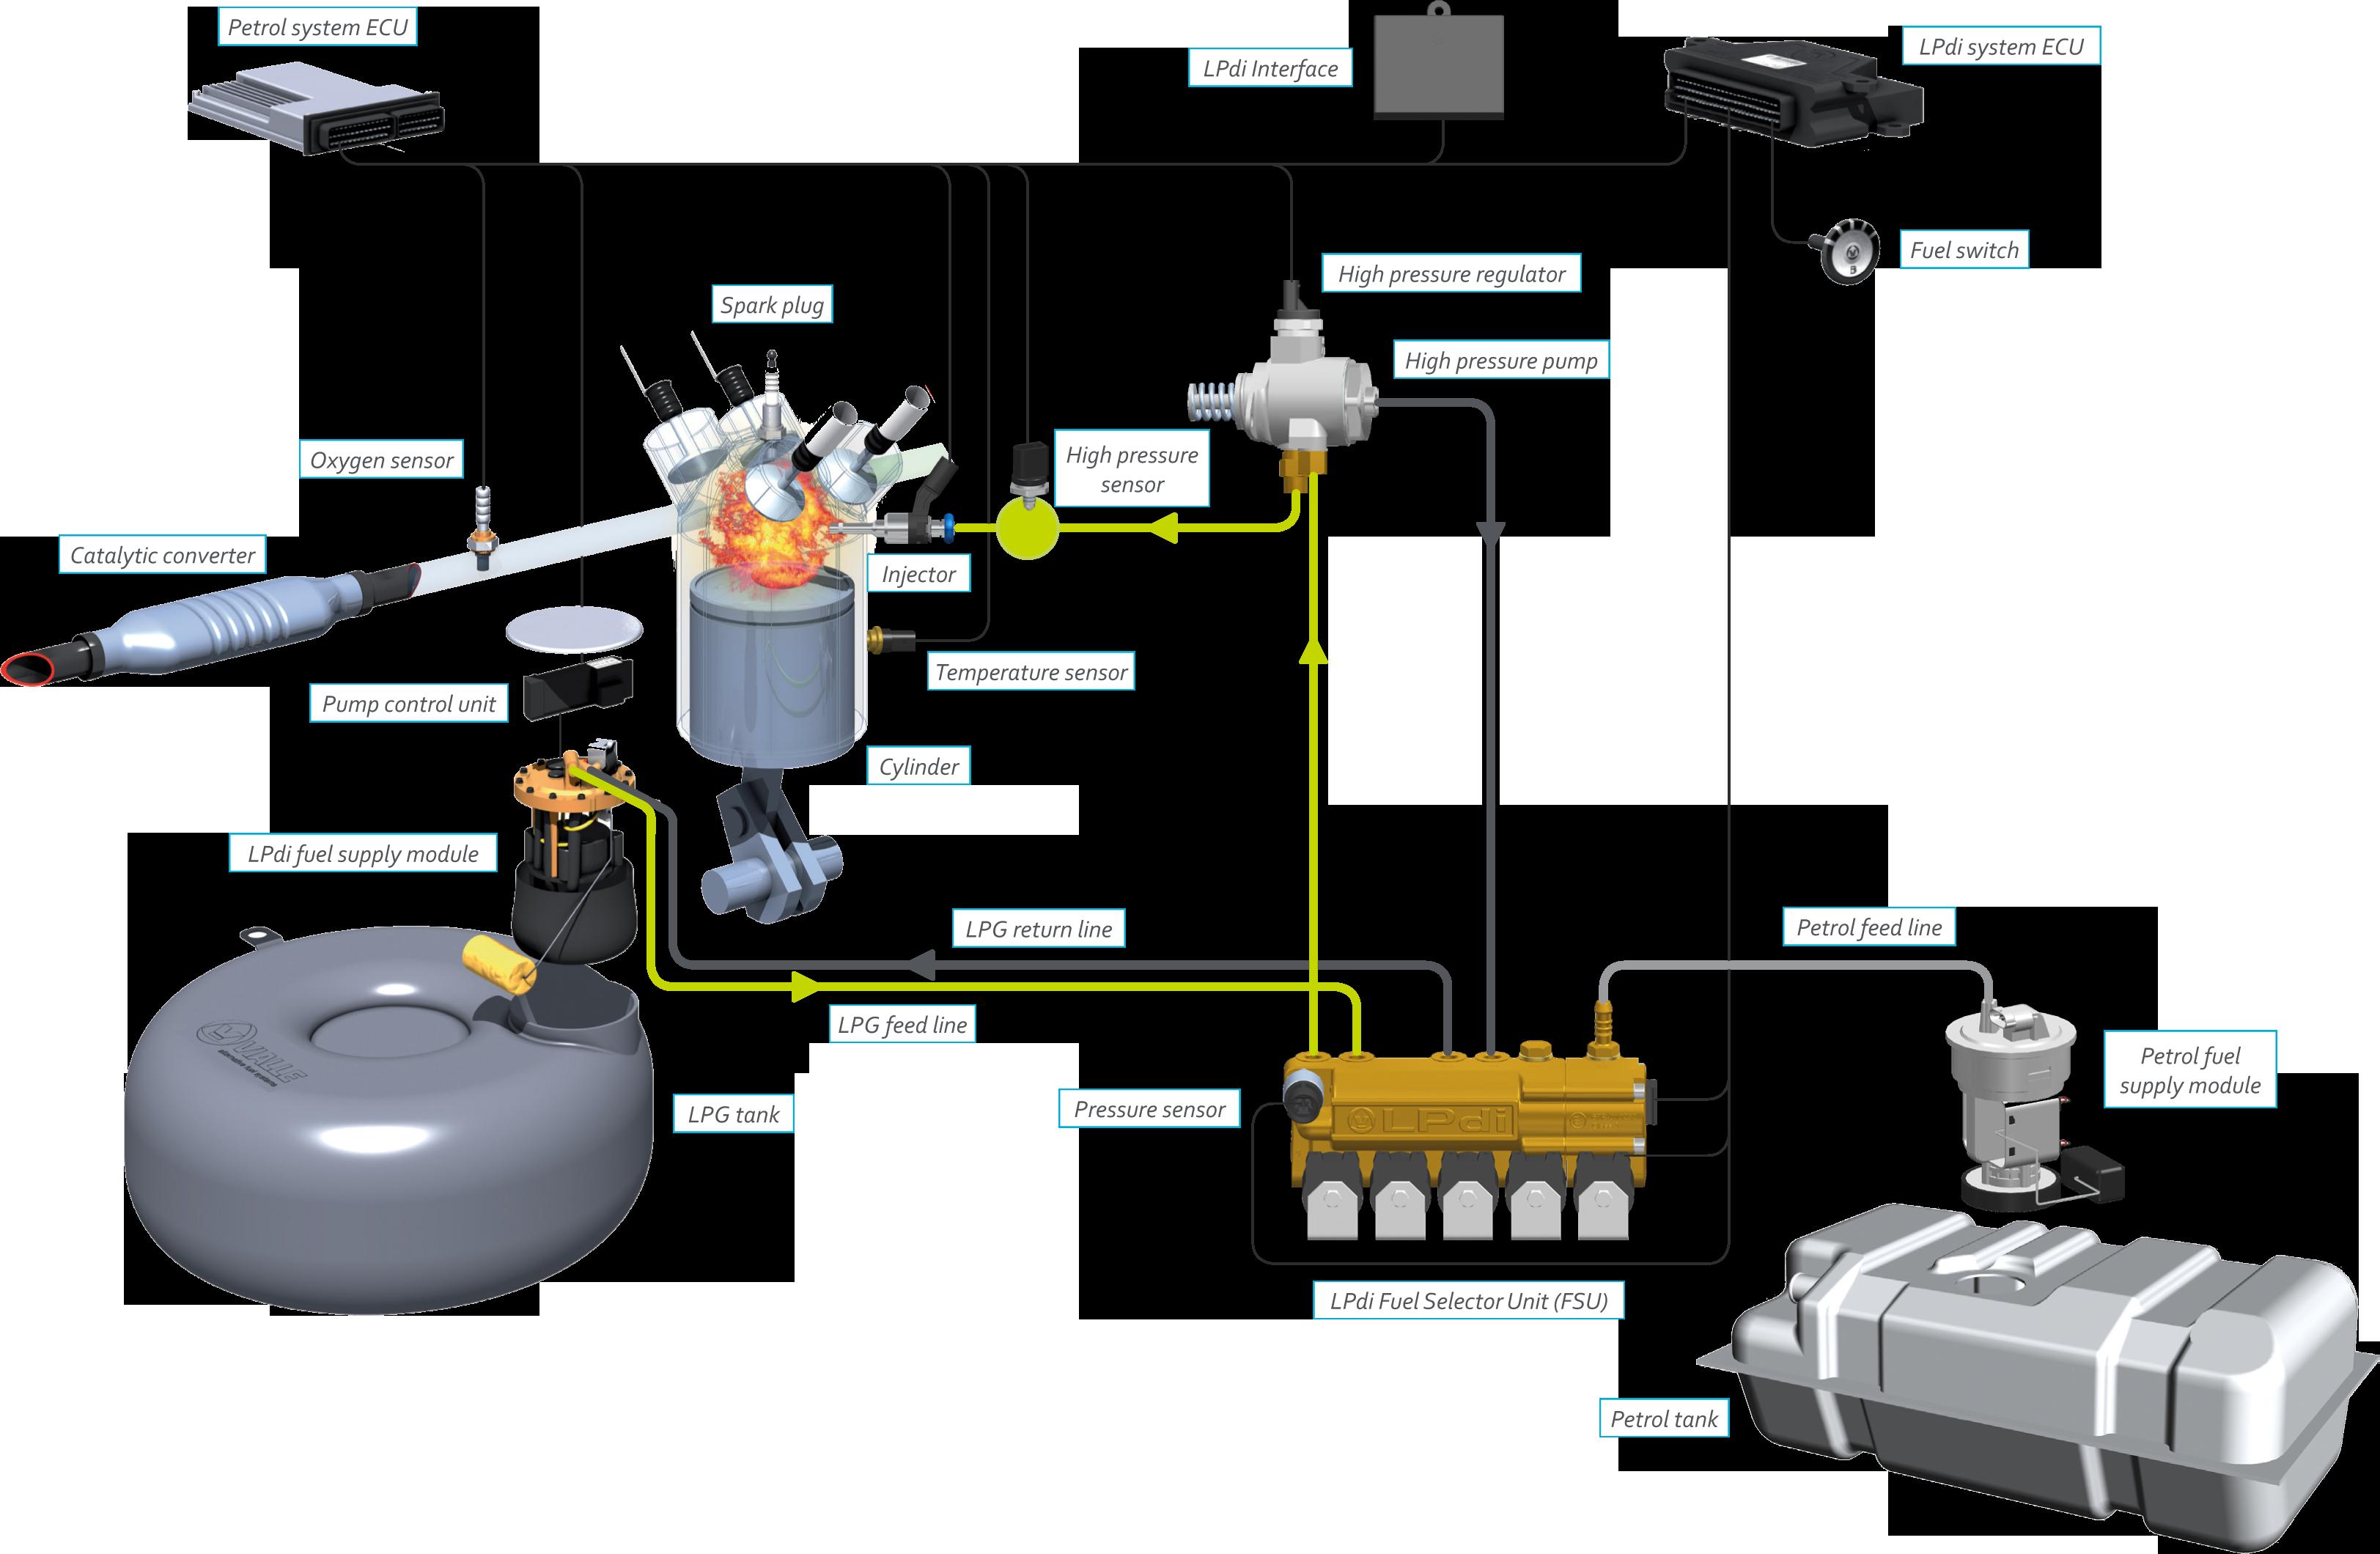 lovato gas car system diagram manual today manual guide trends rh brookejasmine co Simple Car Wiring Diagram Simple Car Wiring Diagram